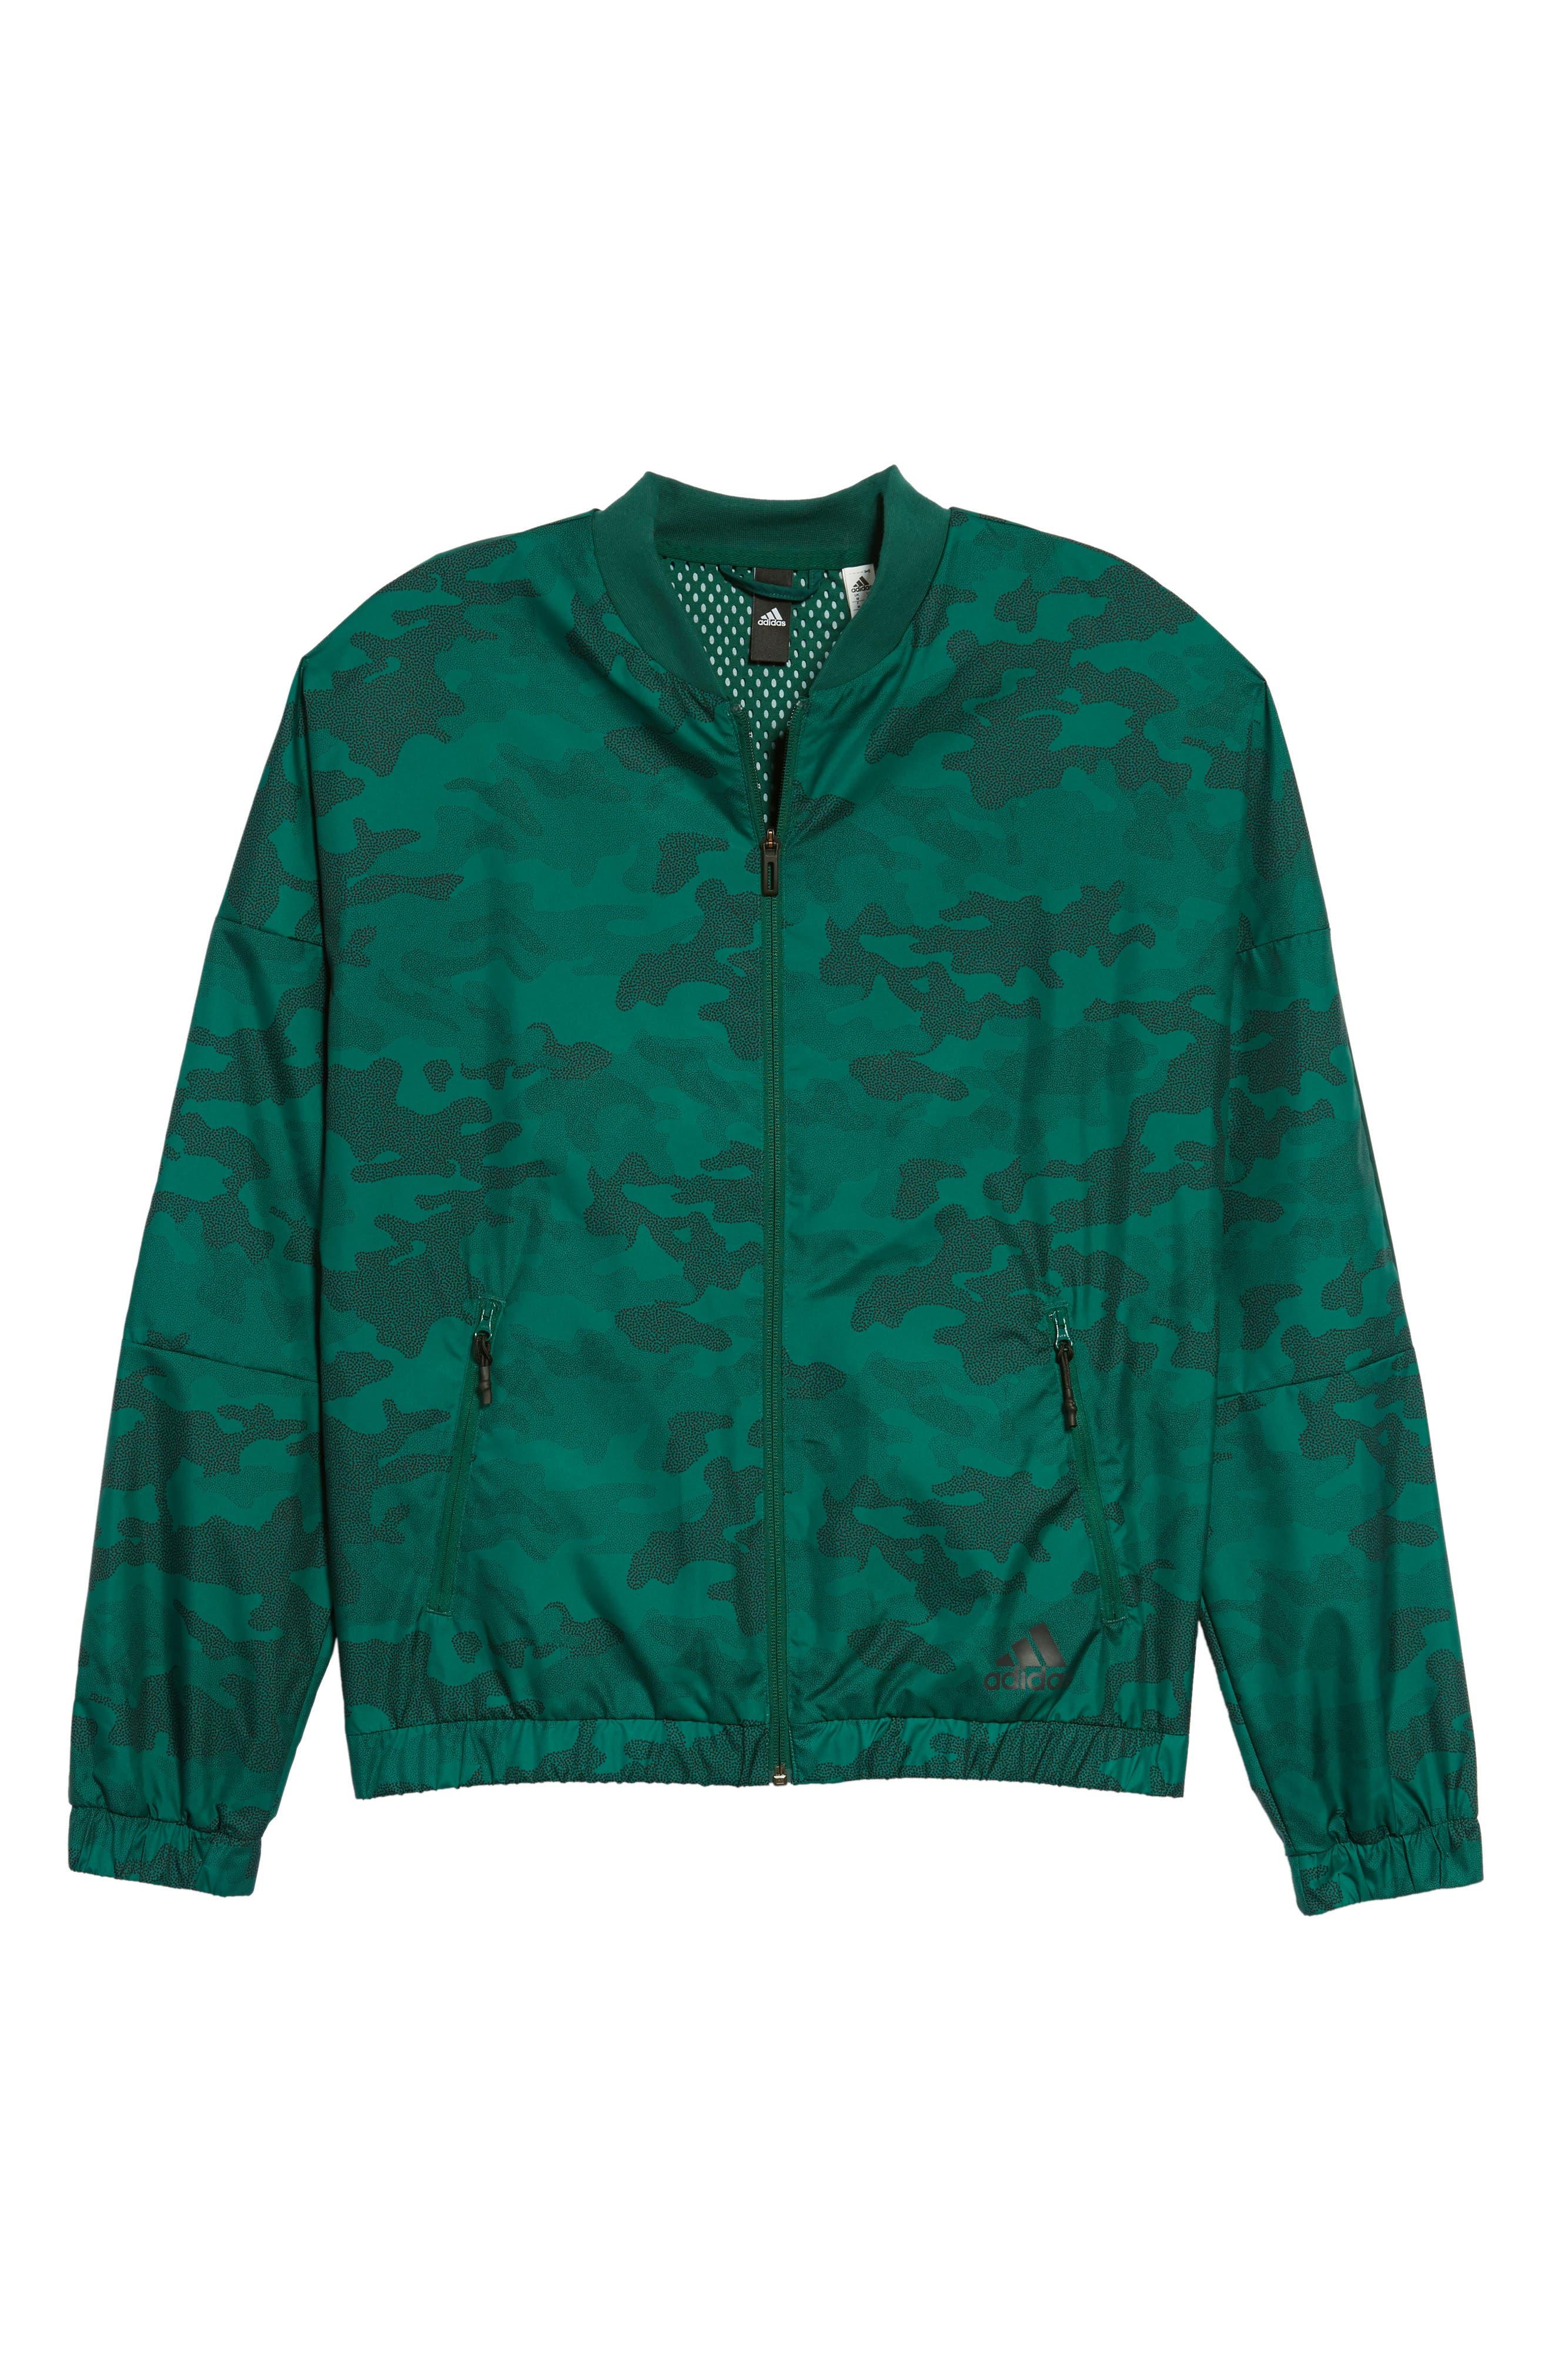 Regular Fit Track Jacket,                             Alternate thumbnail 6, color,                             Collegiate Green/ Black